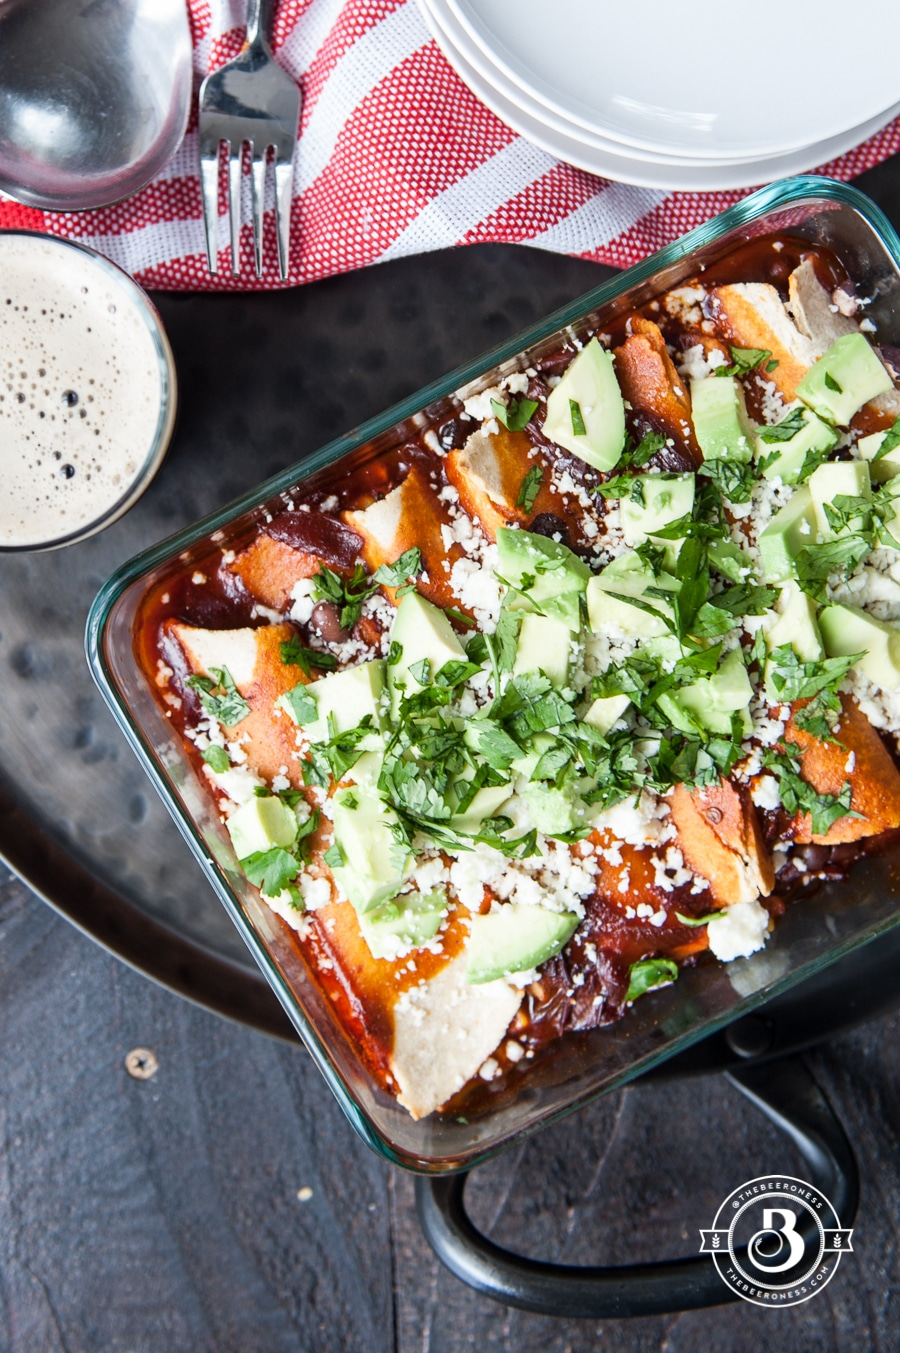 Corn and Black Bean Enchiladas are part of this 50 Best Vegan Cinco de Mayo Recipe Roundup Post